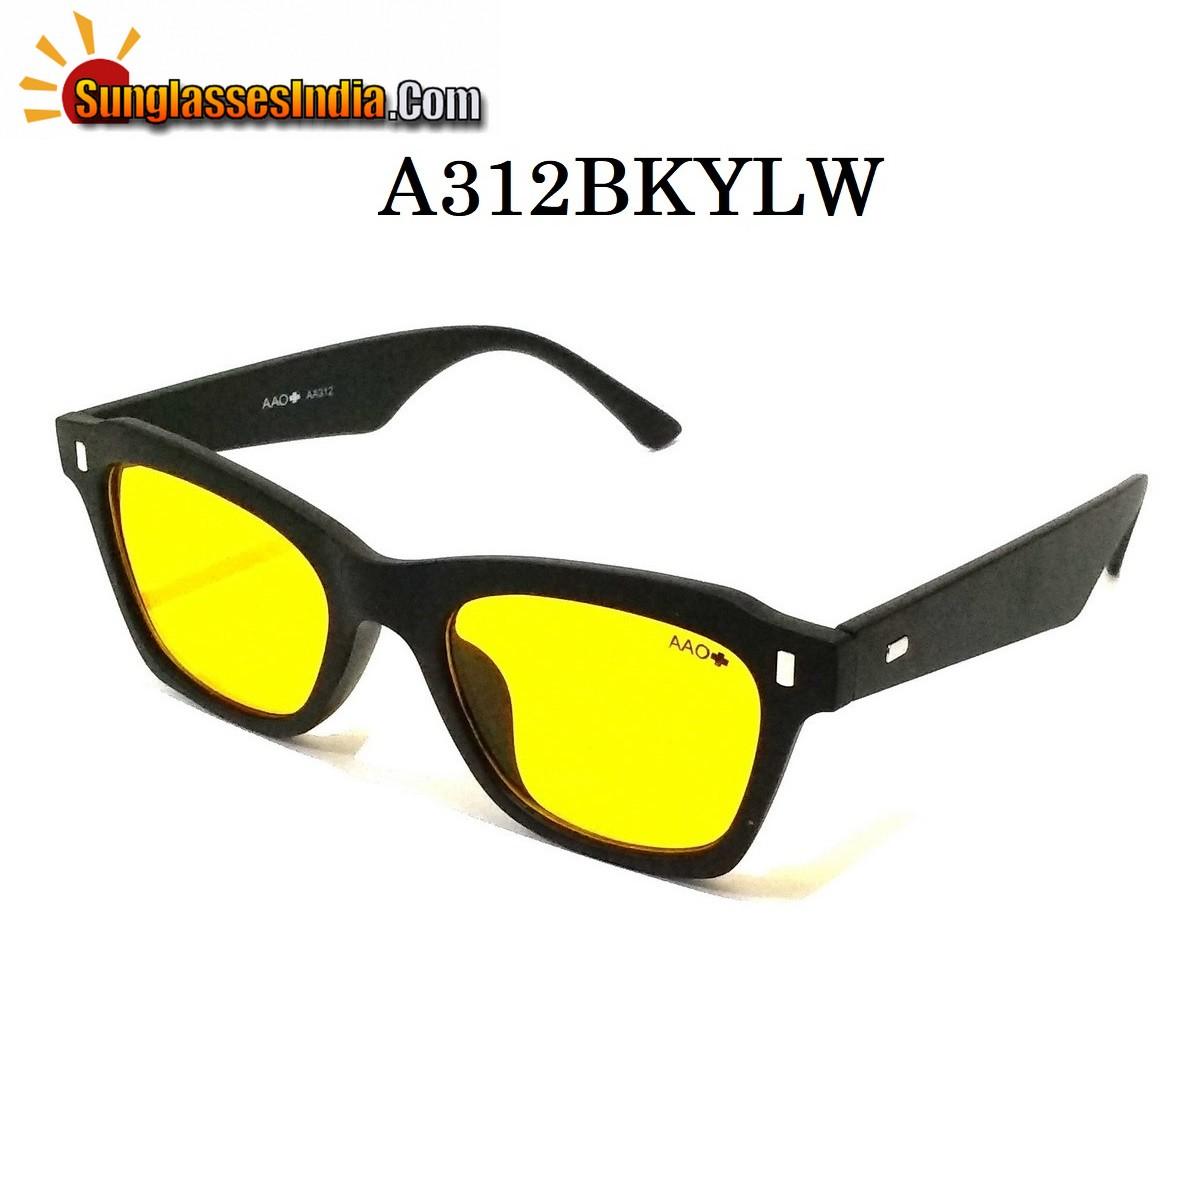 HD Vision Night Driving Wayfare Sunglasses A312BKYL